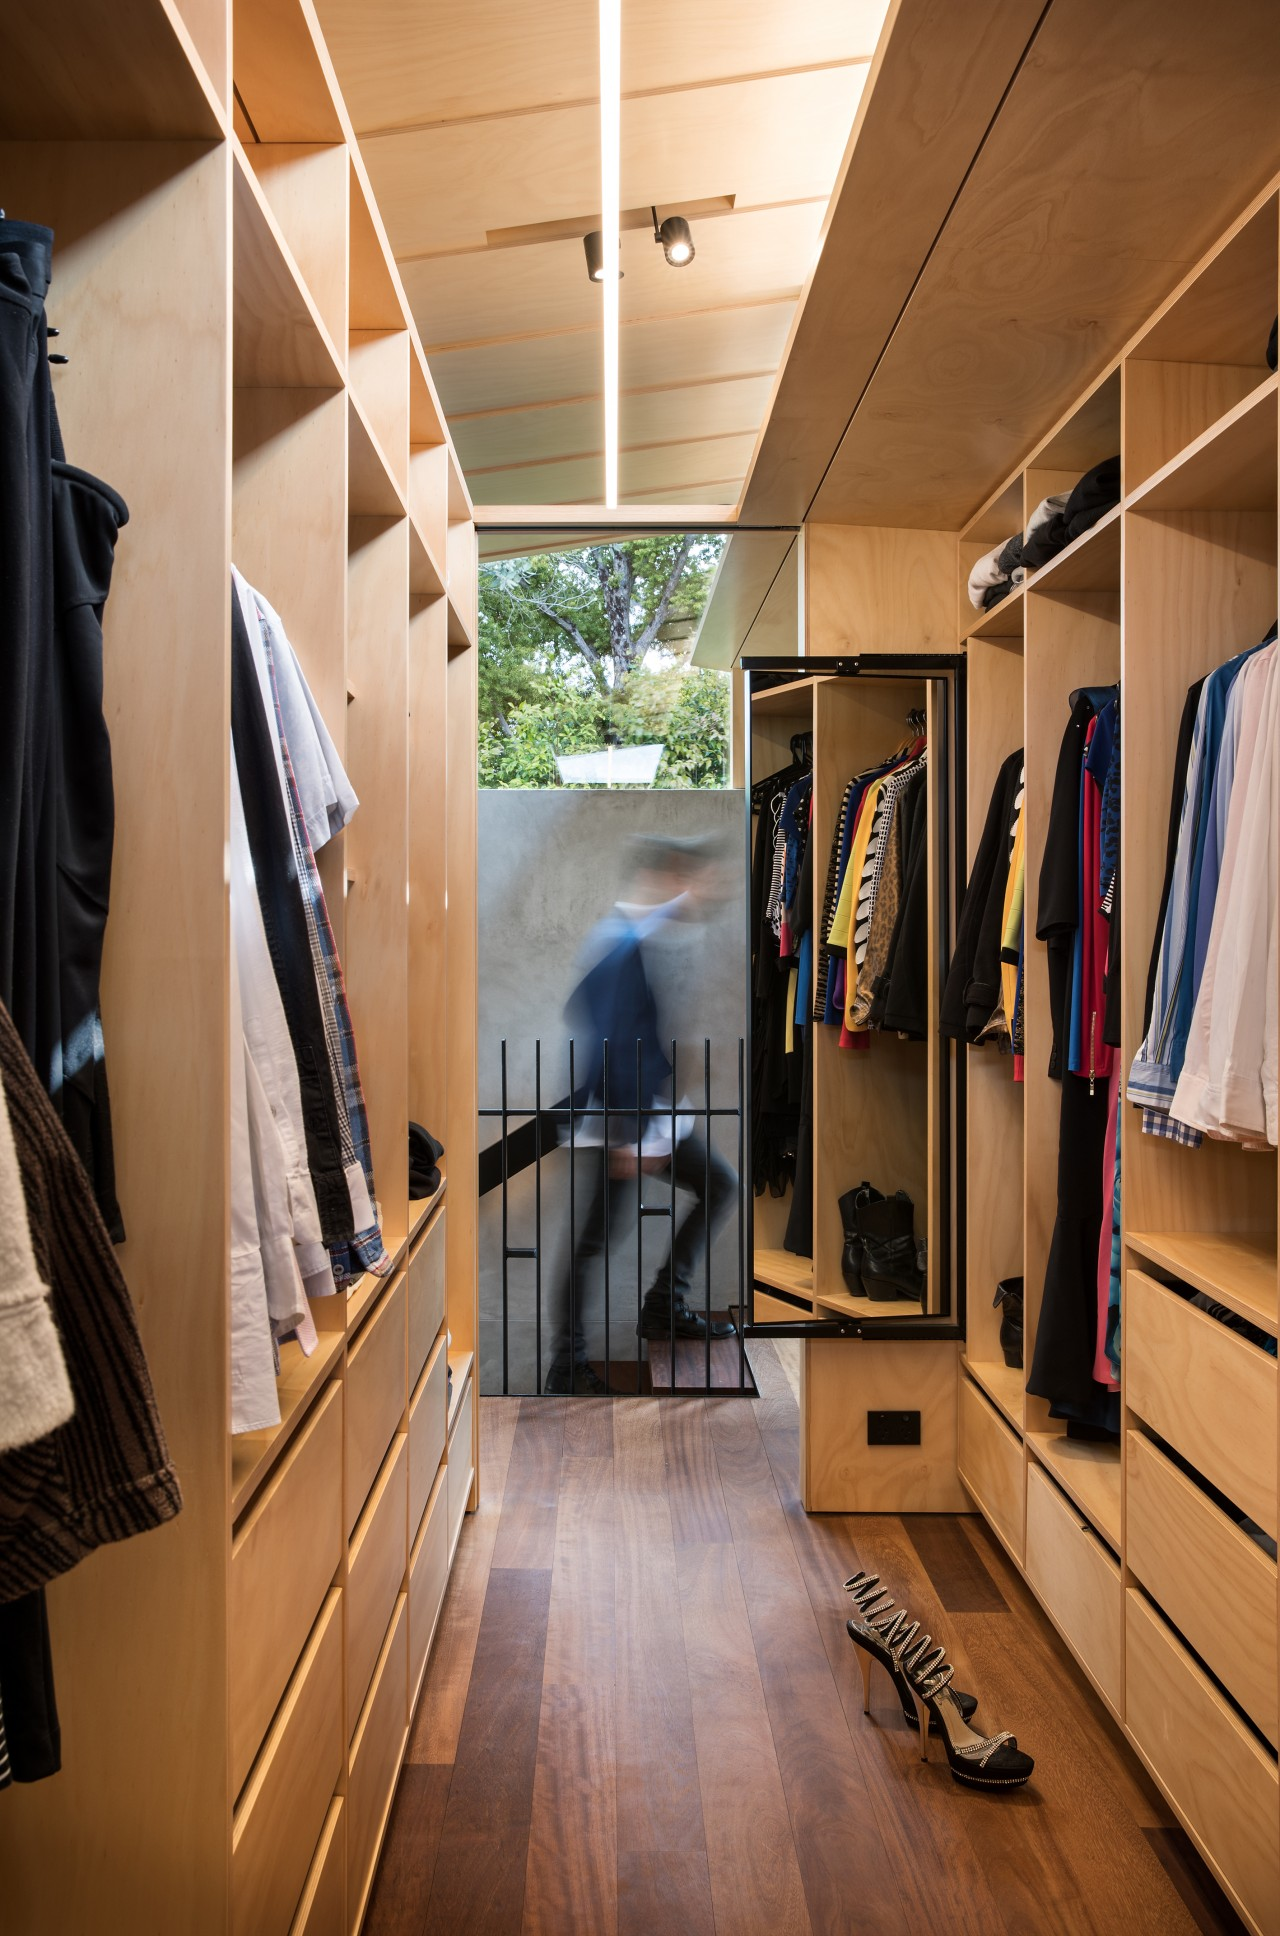 Master wardrobe – master suite designed by Strachan boutique, ceiling, closet, floor, flooring, furniture, interior design, room, wardrobe, wood, brown